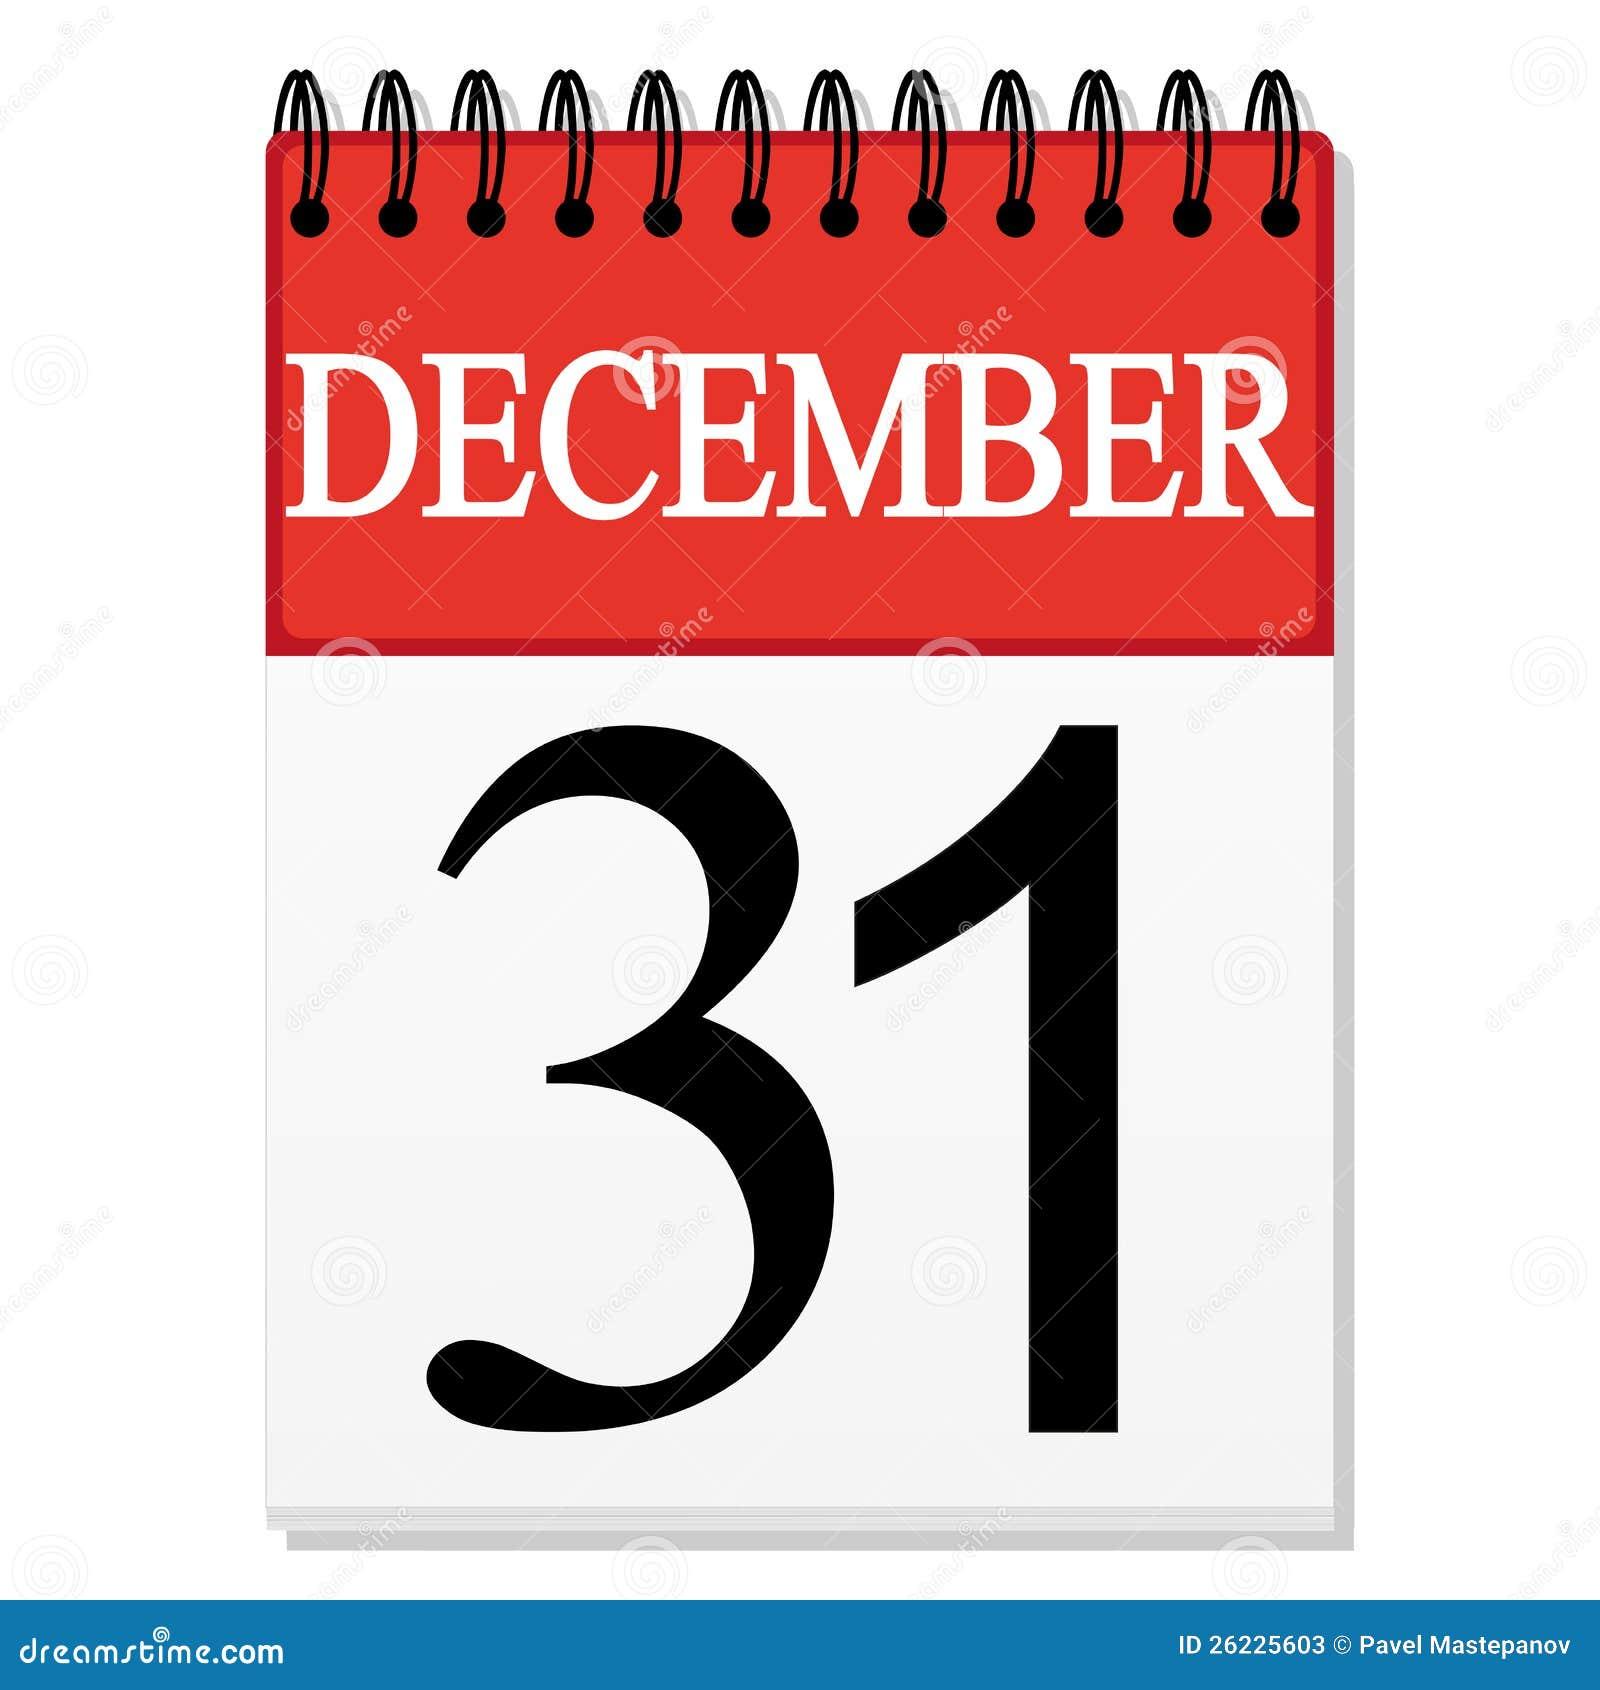 List Calendar December 31 Stock Photos - Image: 26225603